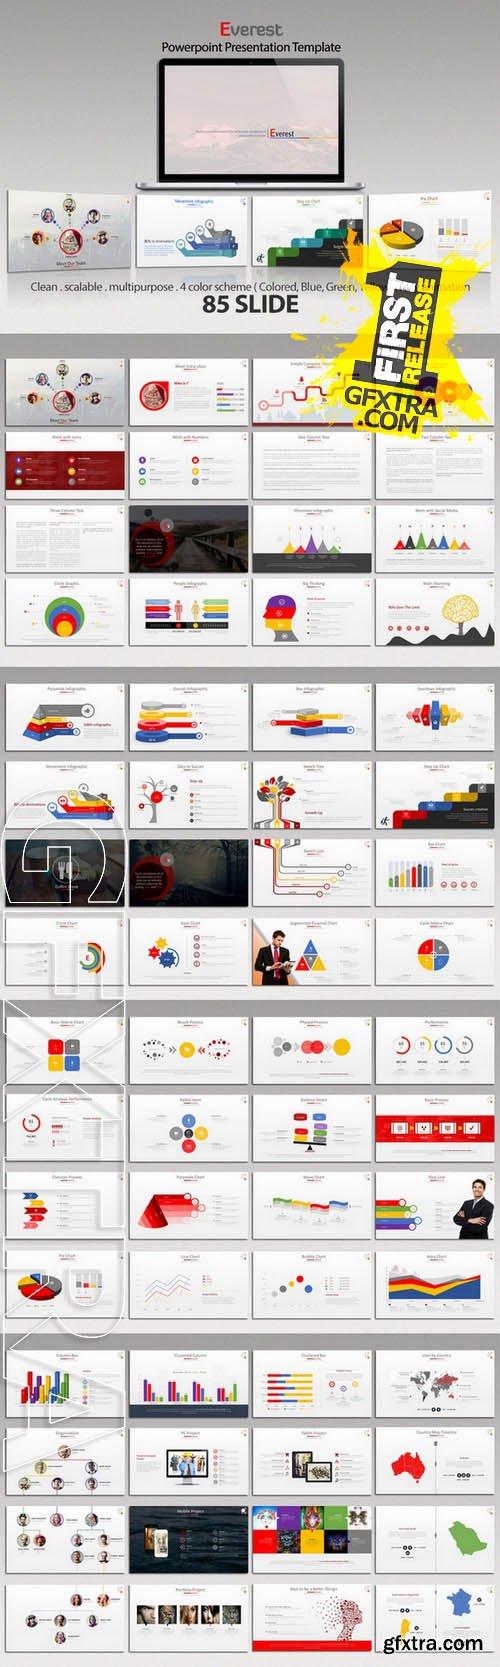 Everest Powerpoint Template - Creativemarket 129929